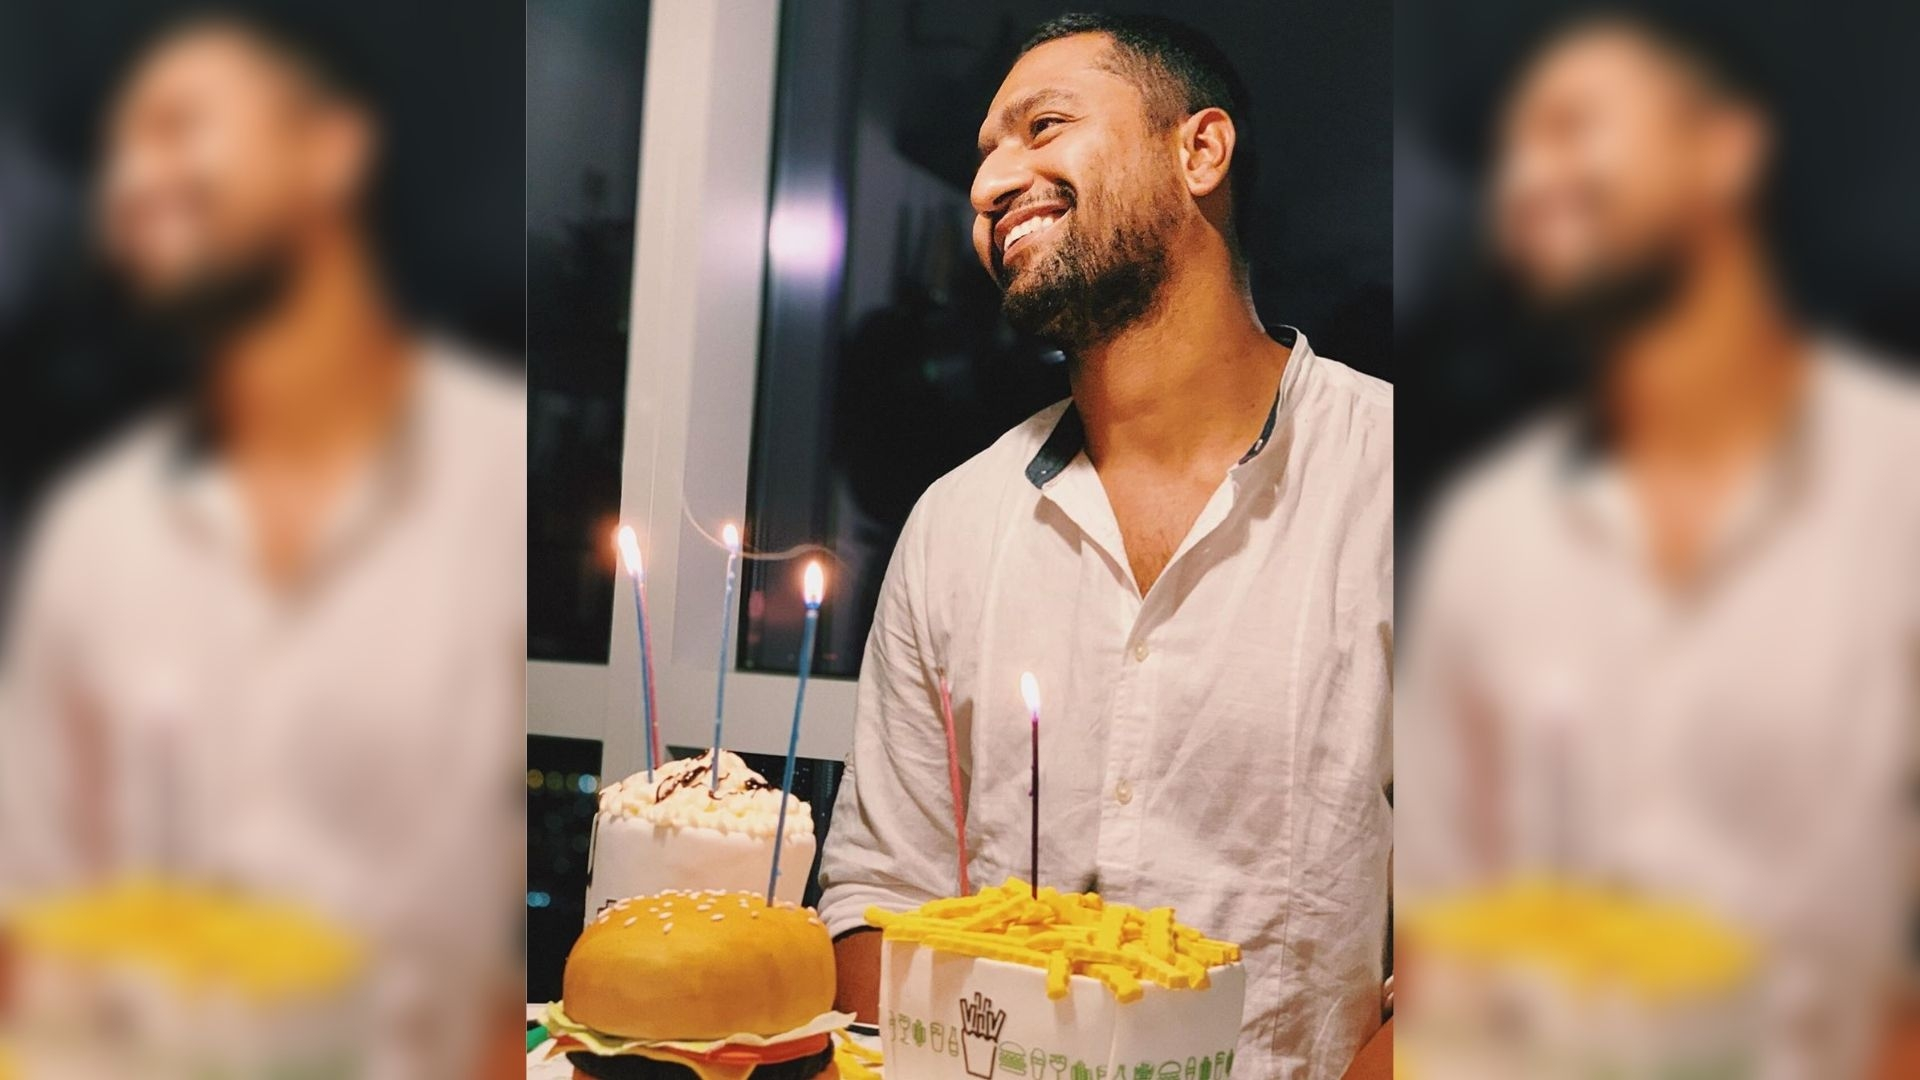 Alia, Taapsee & More Wish Vicky Kaushal on His 31st Birthday